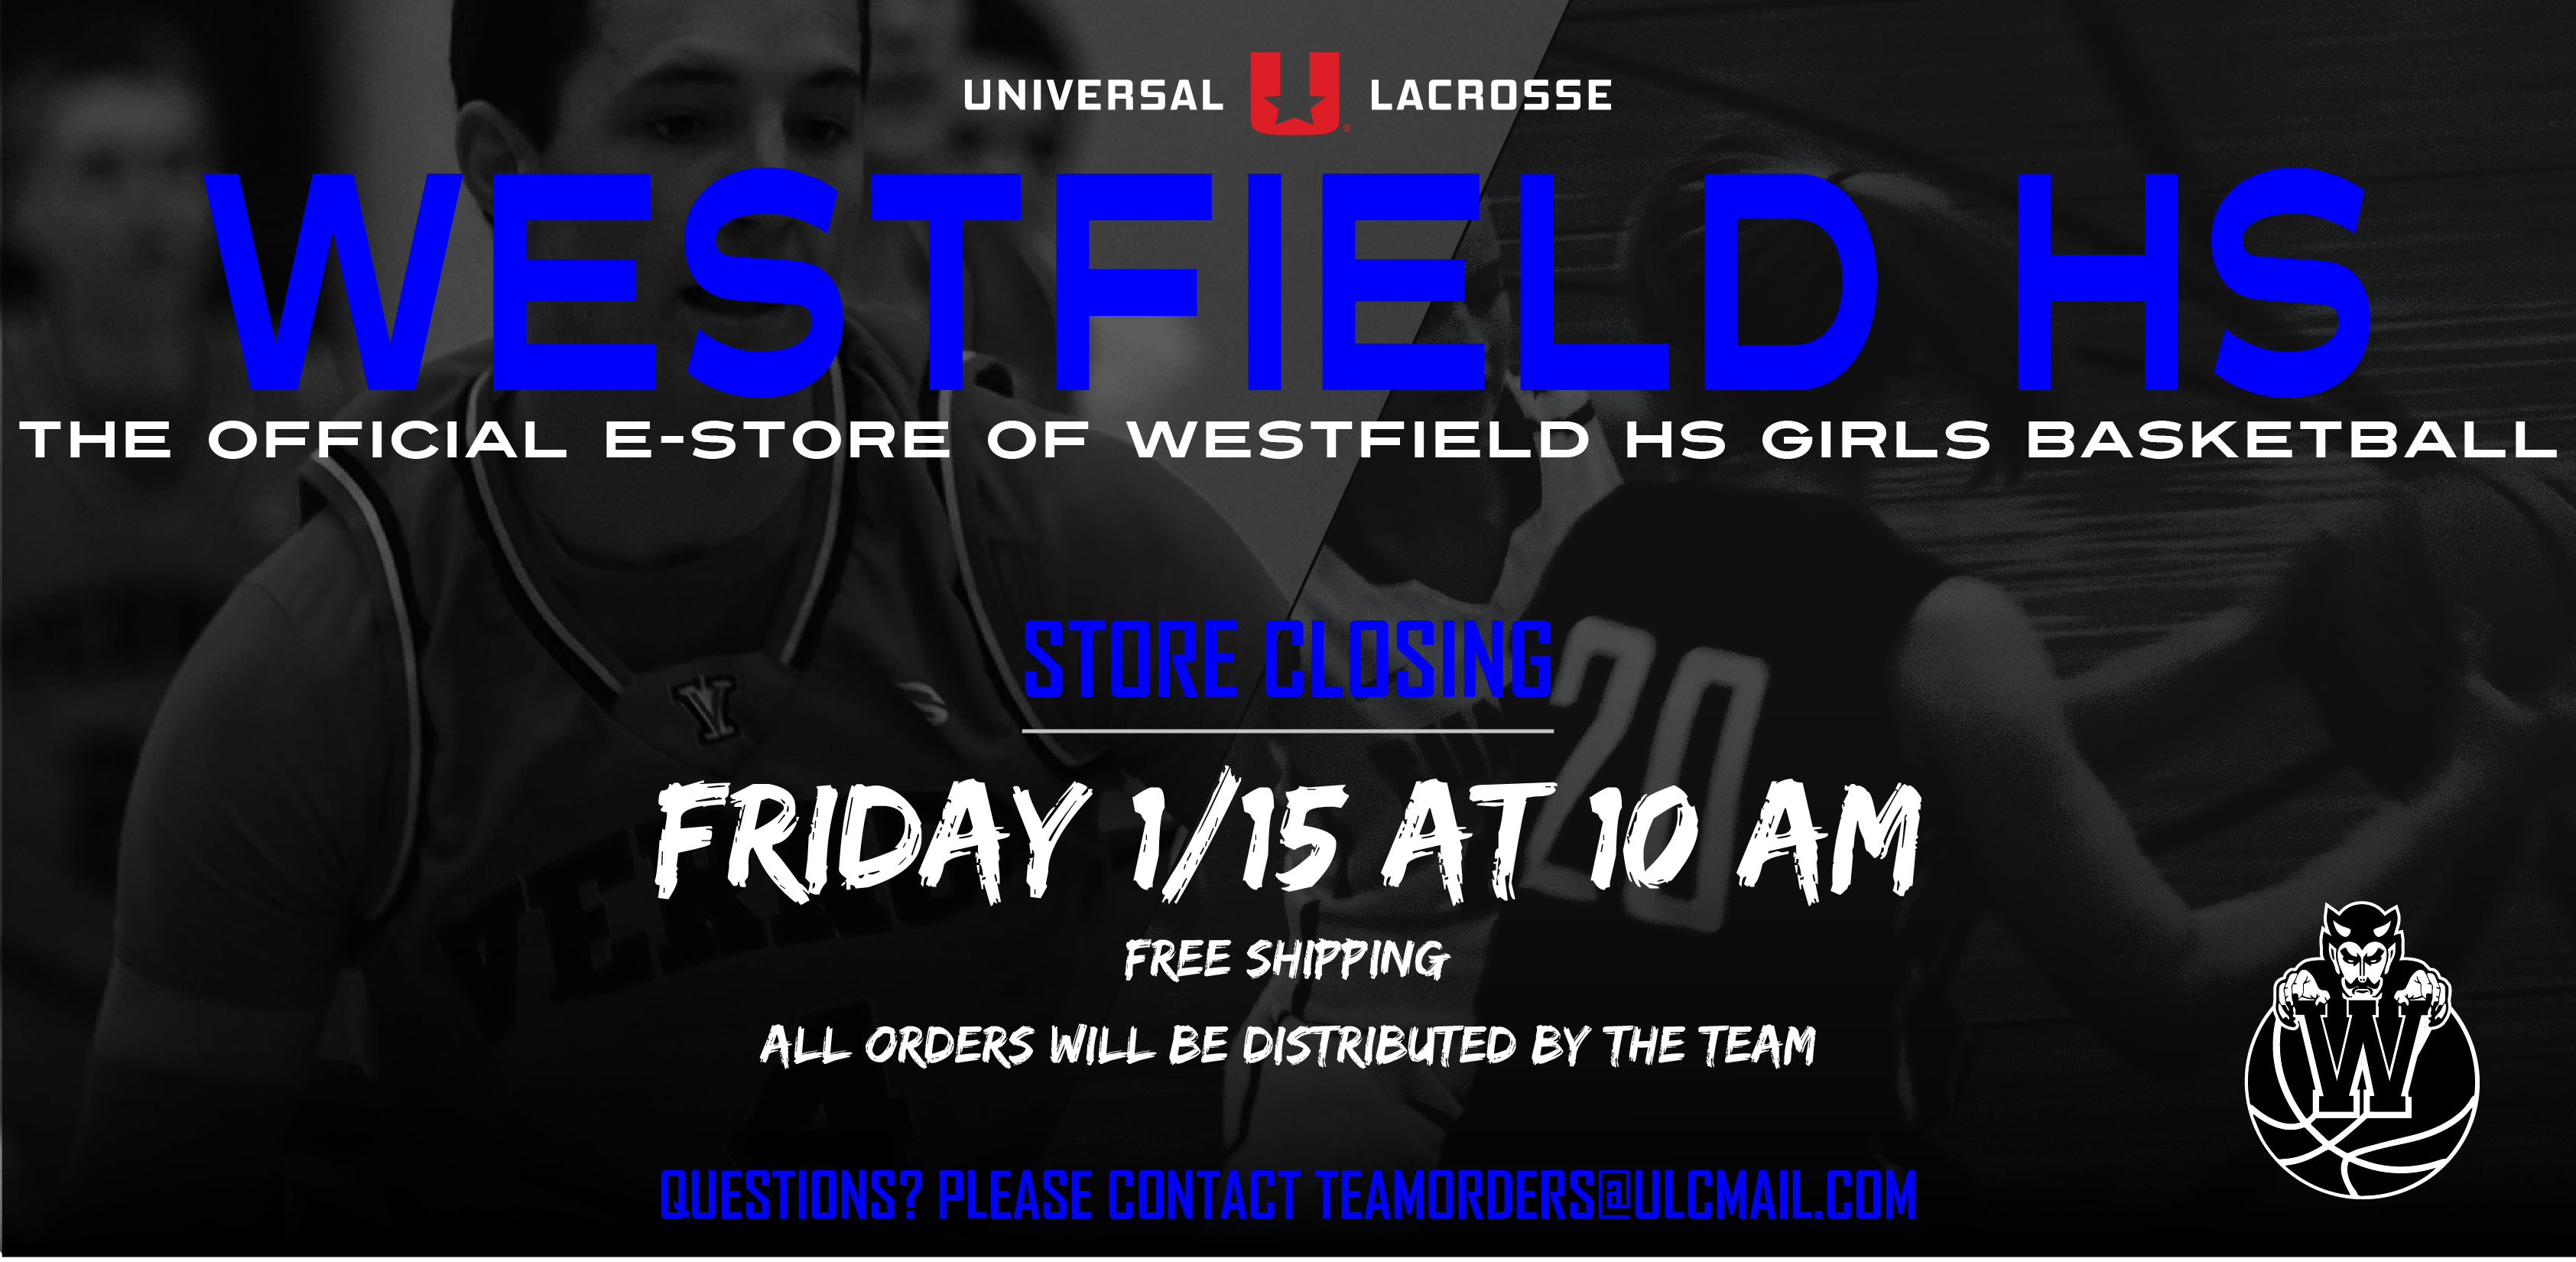 Westfield HS Girls Basketball